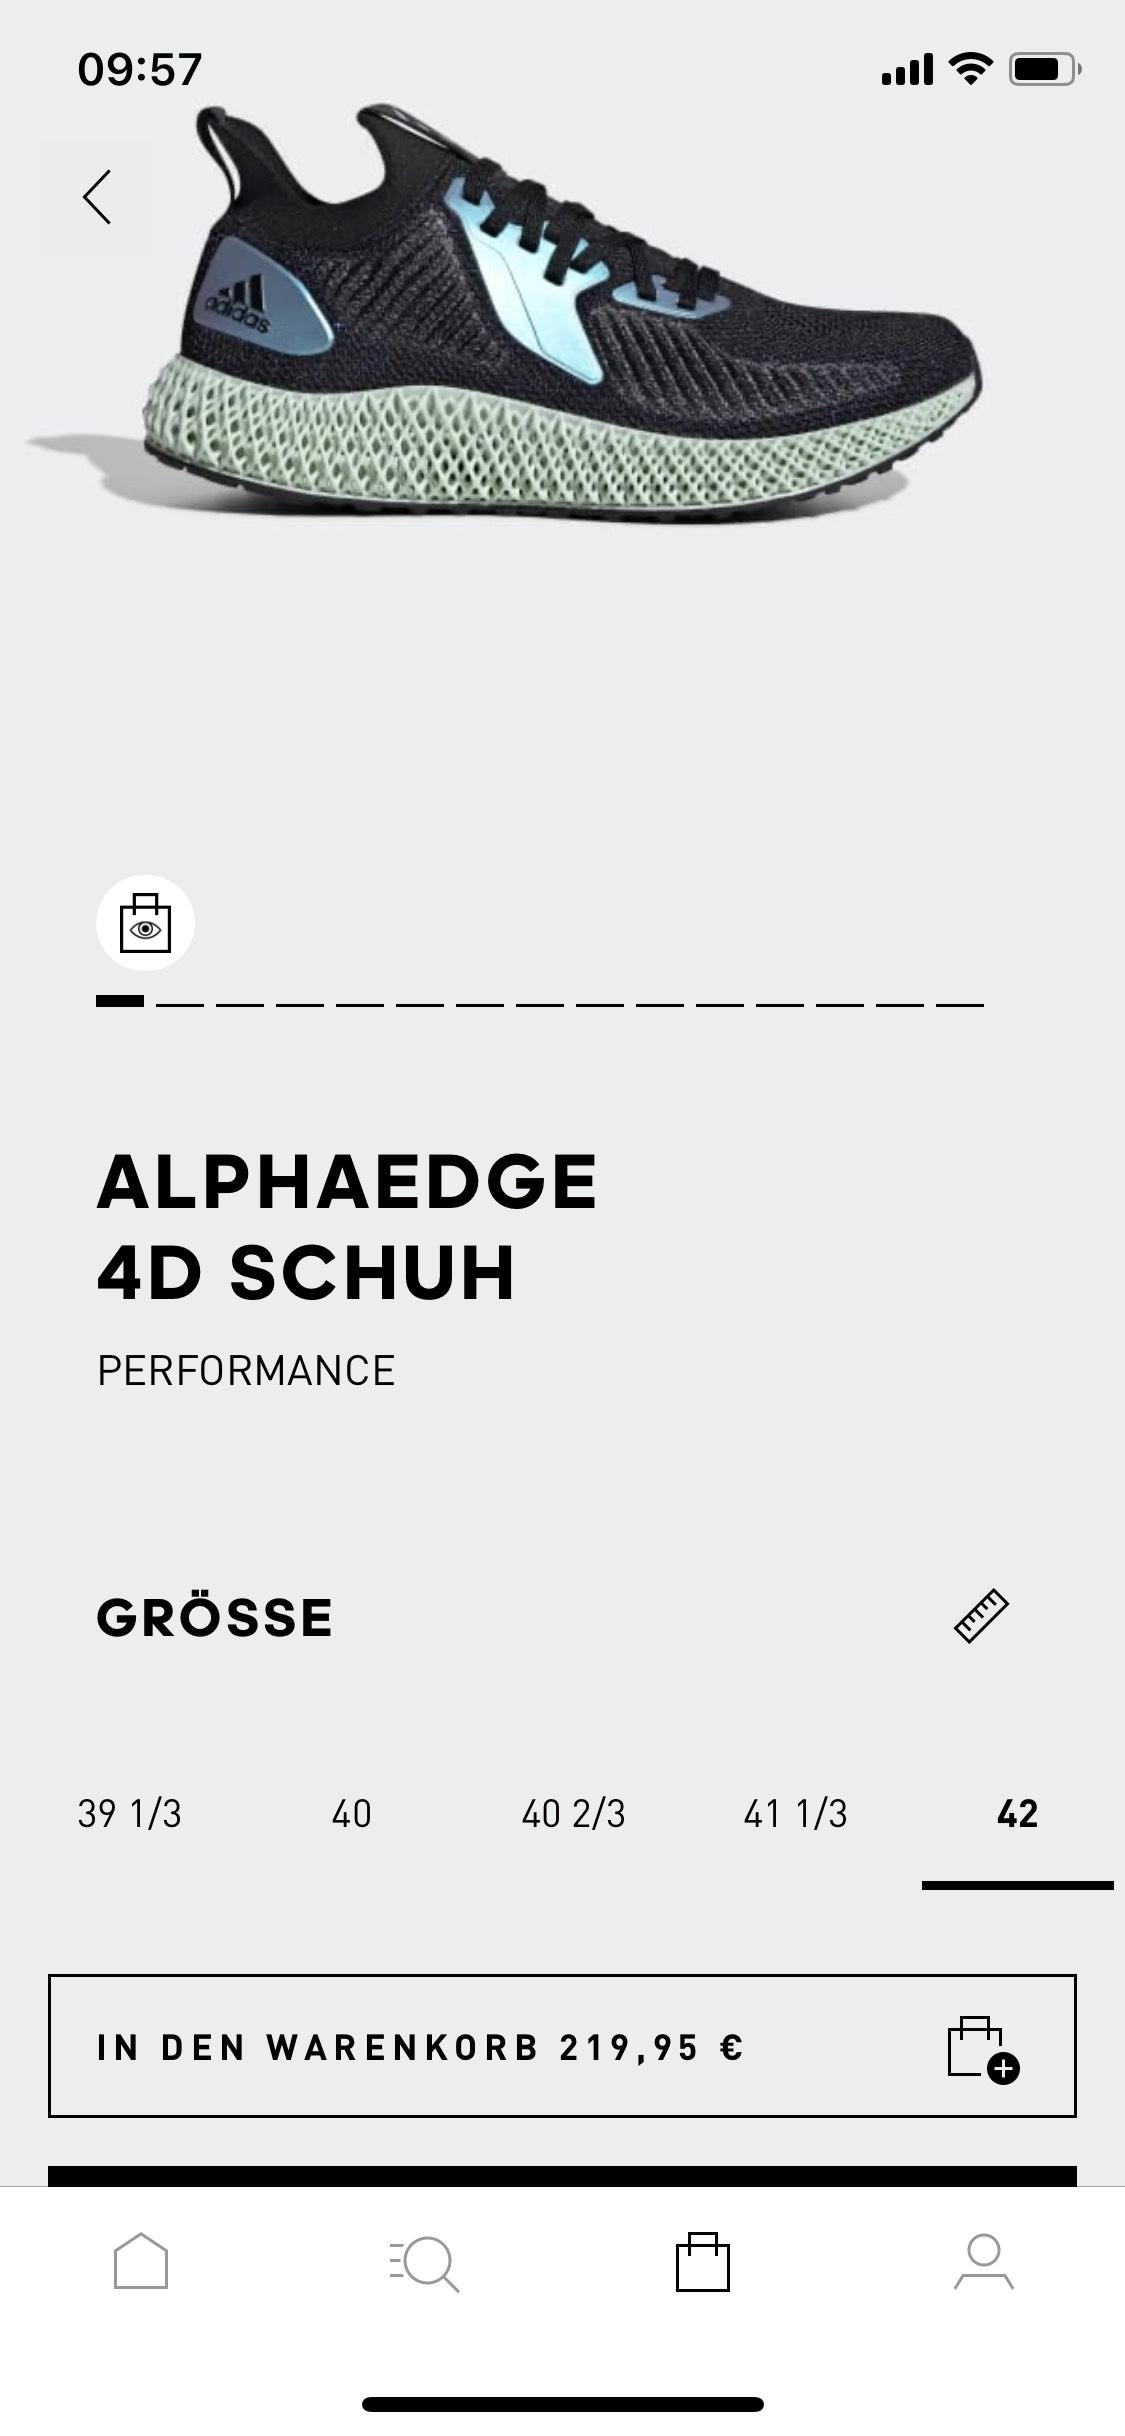 Adidas ALPHAEDGE 4D SCHUH